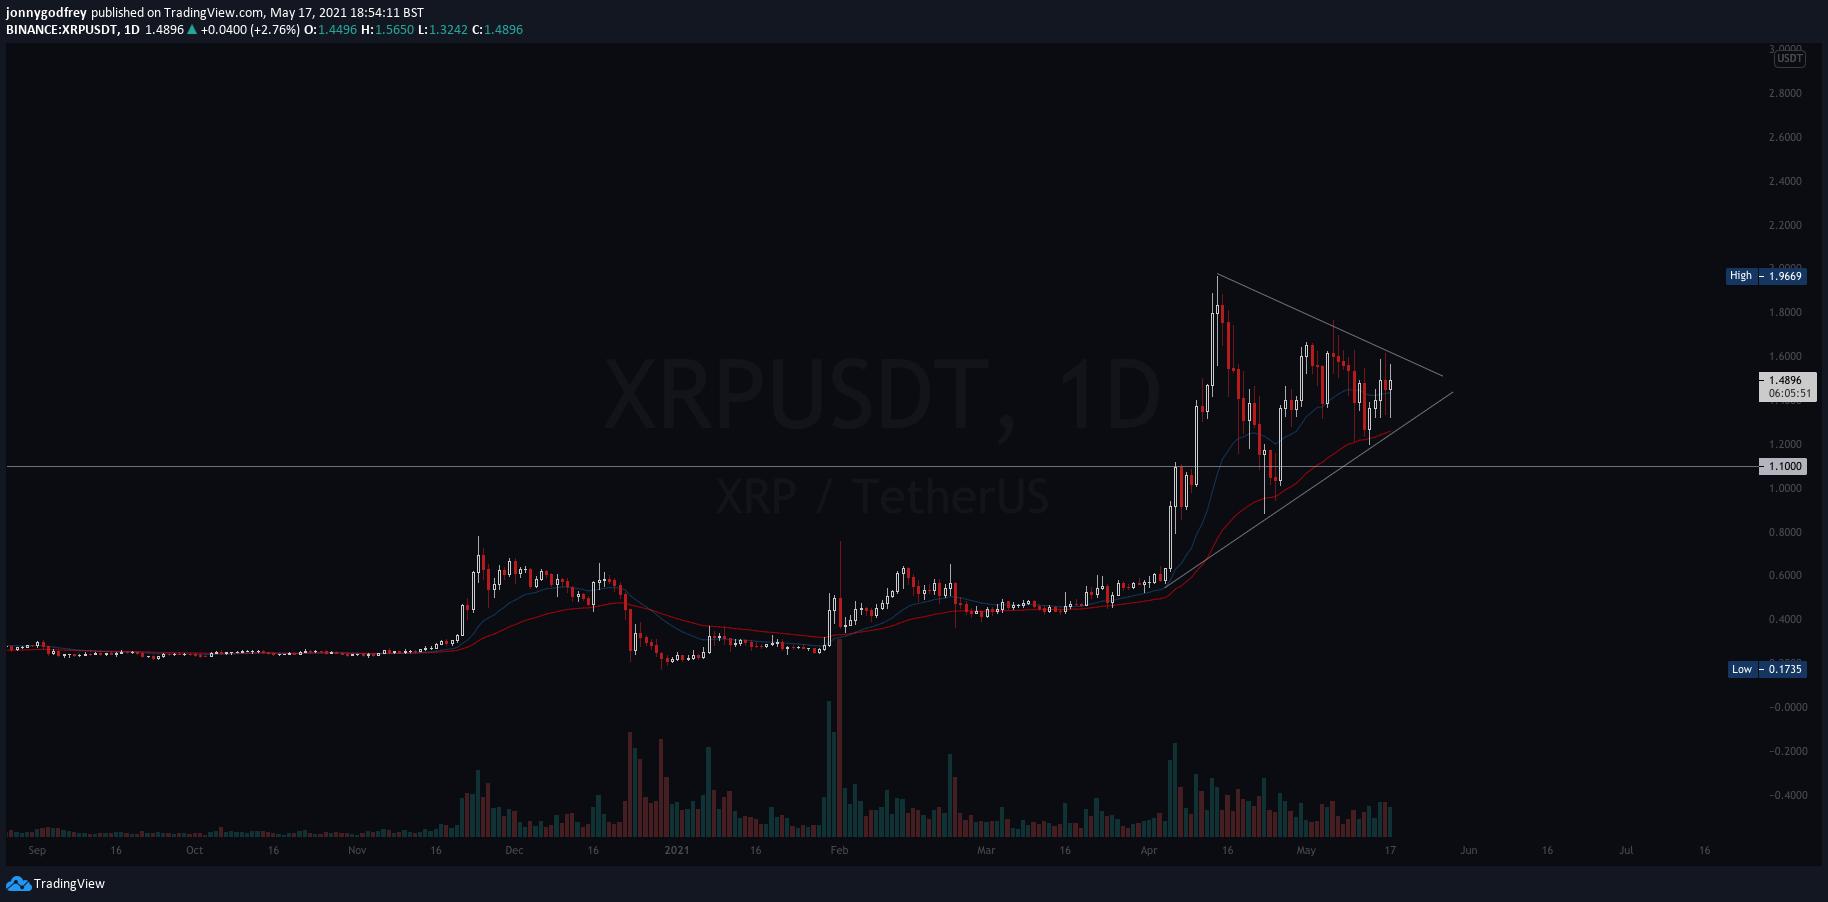 XRPUSD daily chart